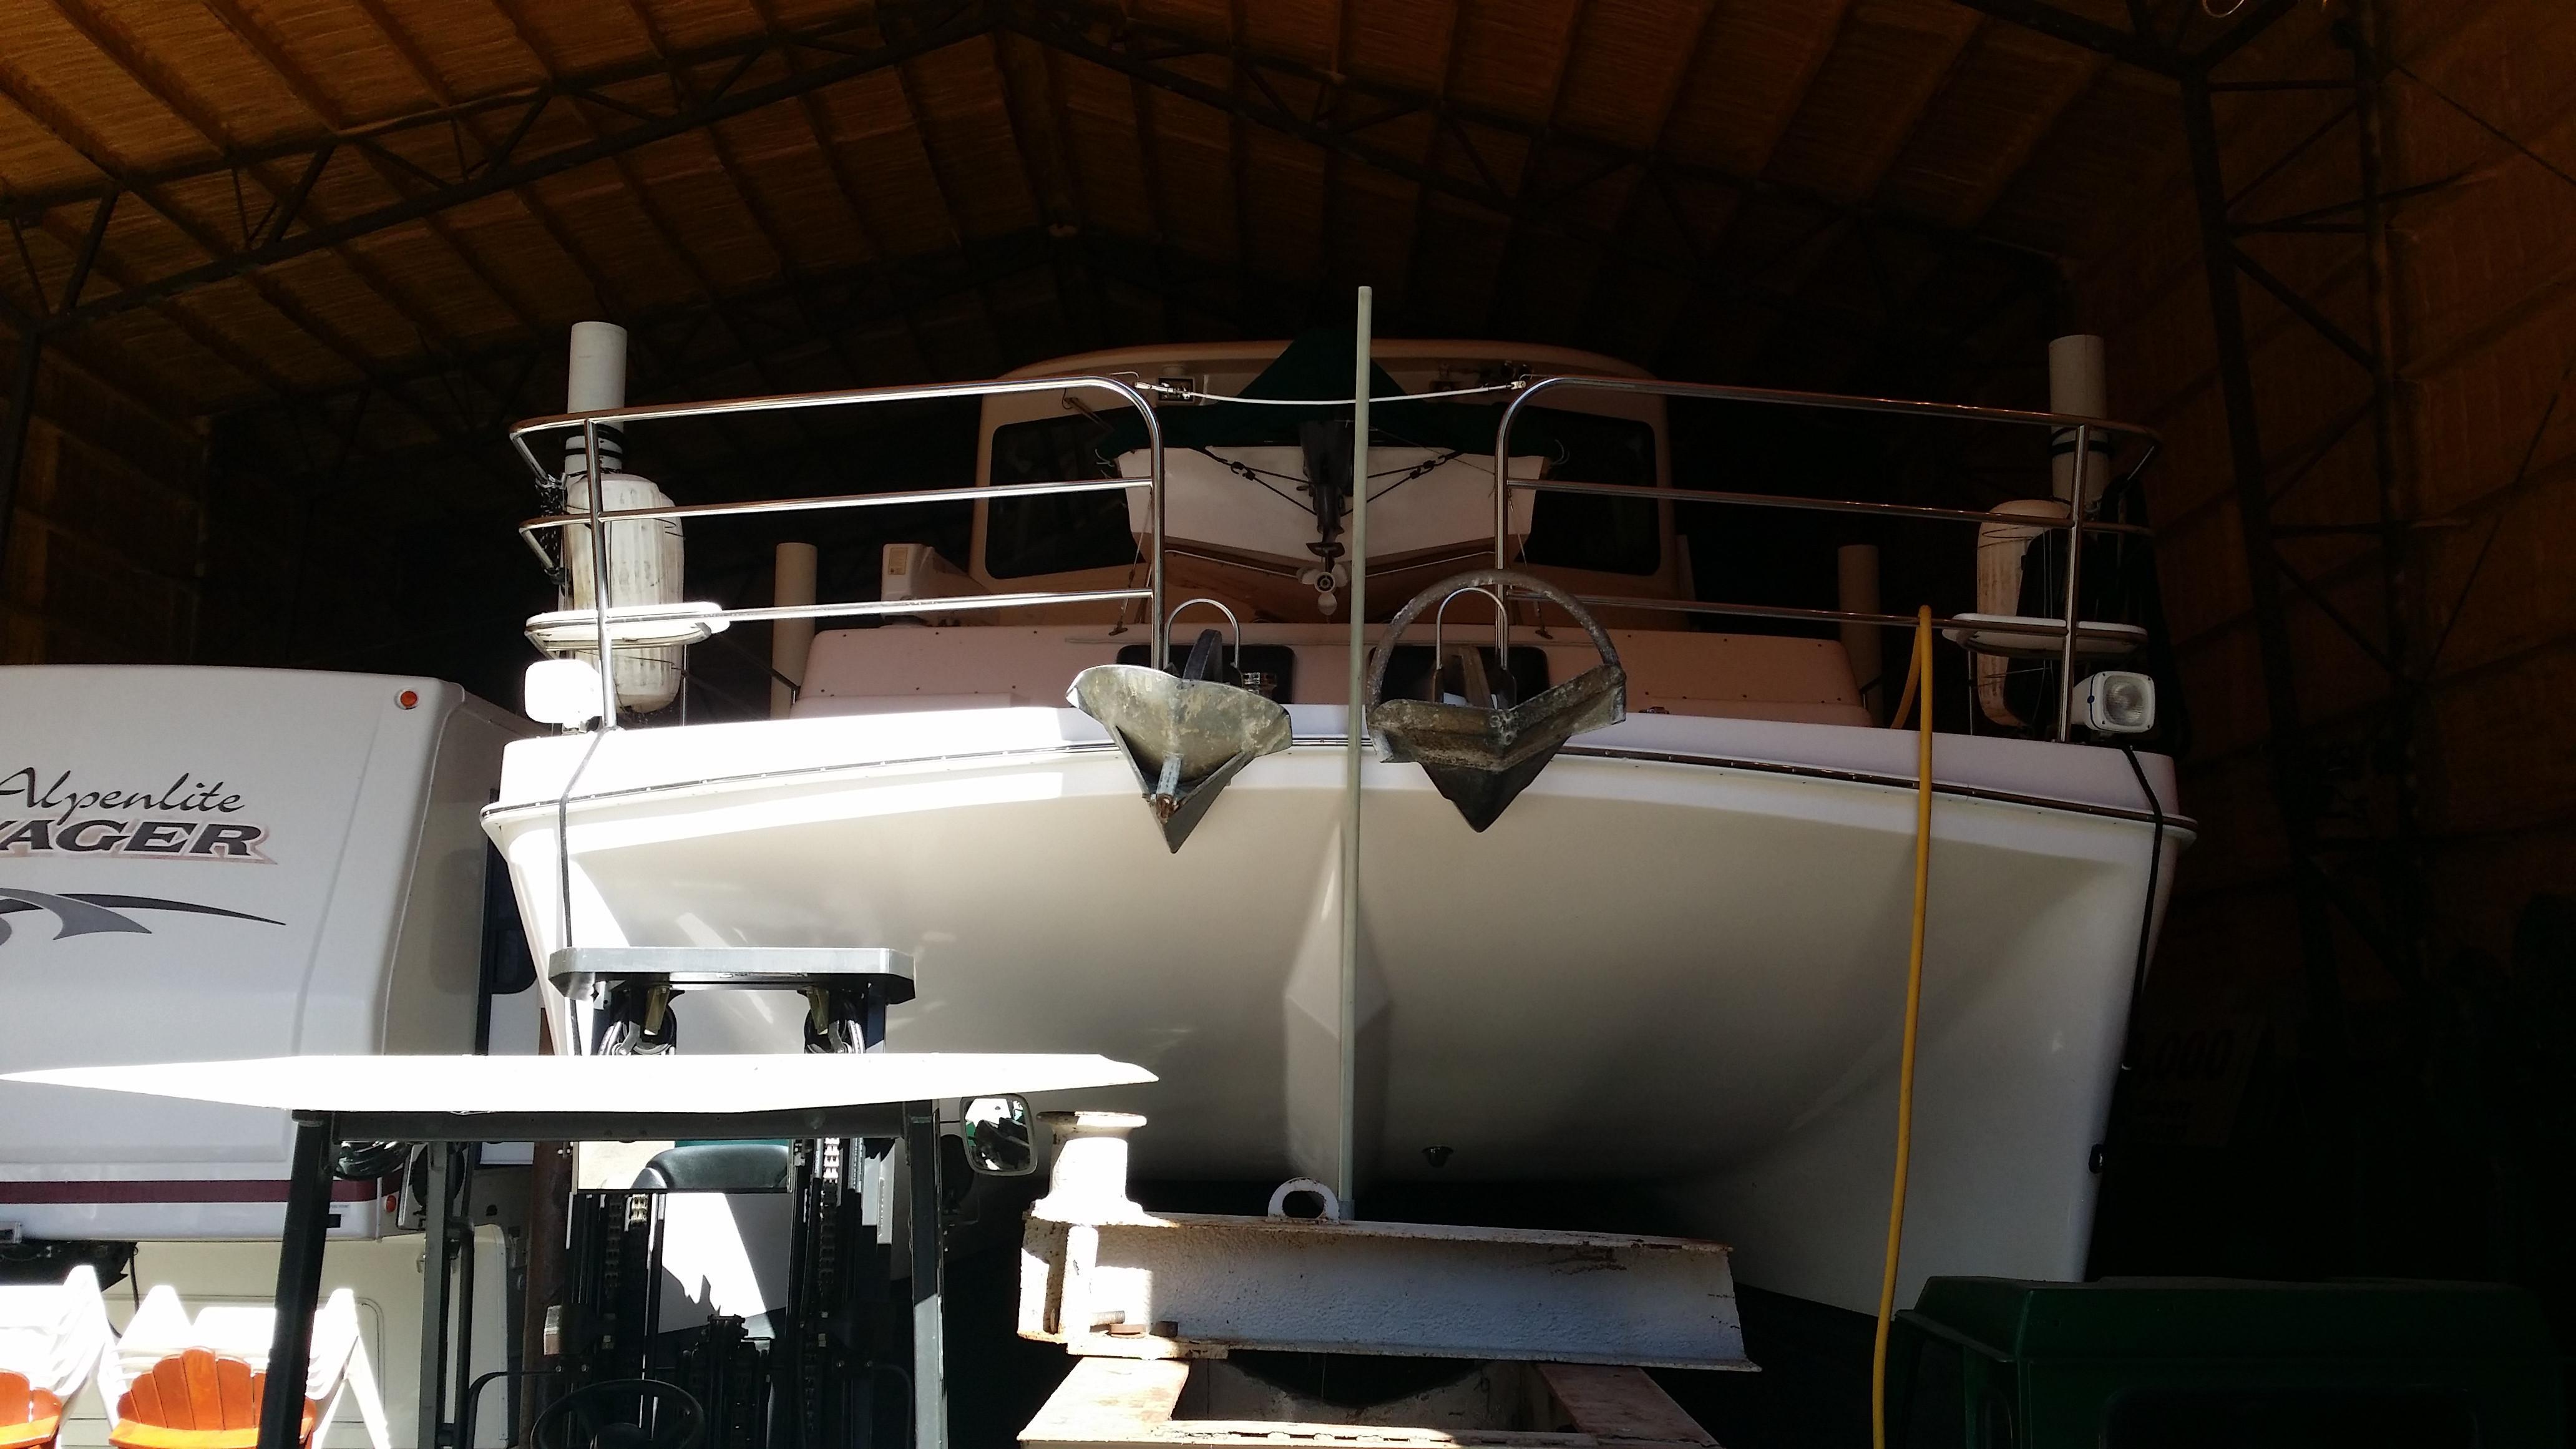 Cozy Winter Yacht Storage (Land & Sea)